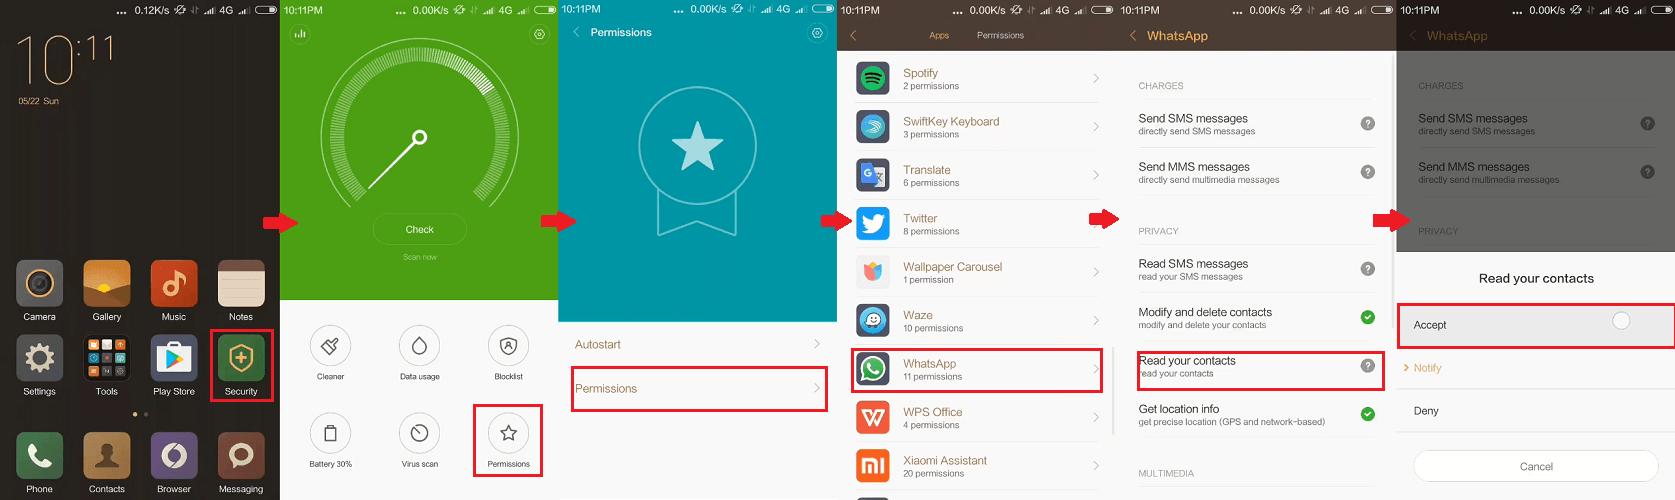 Gambar Kontak WhatsApp Tidak Muncul di Xiaomi